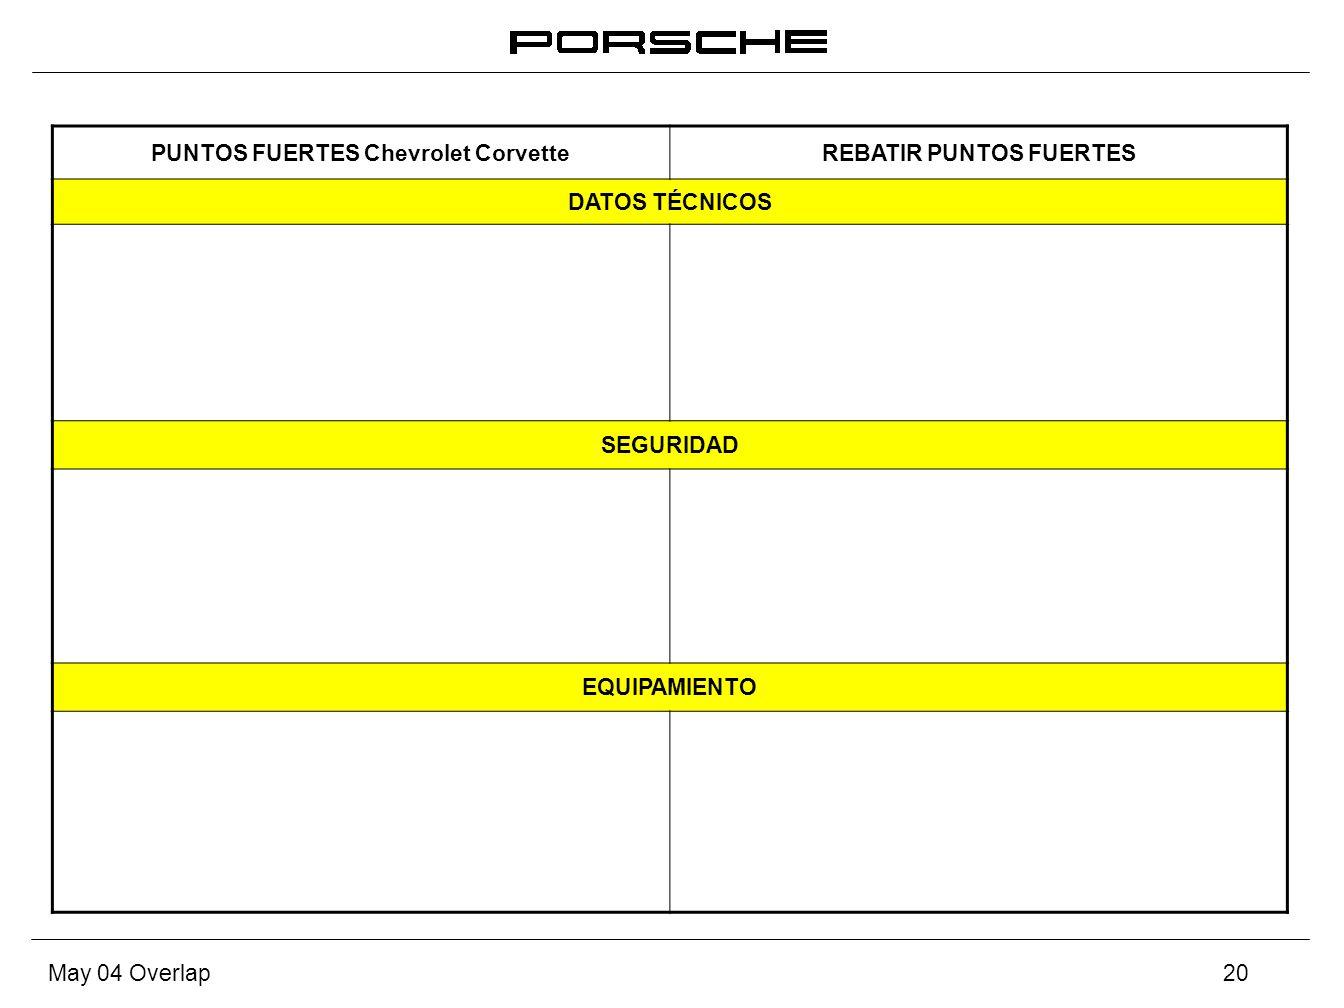 May 04 Overlap20 PUNTOS FUERTES Chevrolet CorvetteREBATIR PUNTOS FUERTES DATOS TÉCNICOS SEGURIDAD EQUIPAMIENTO